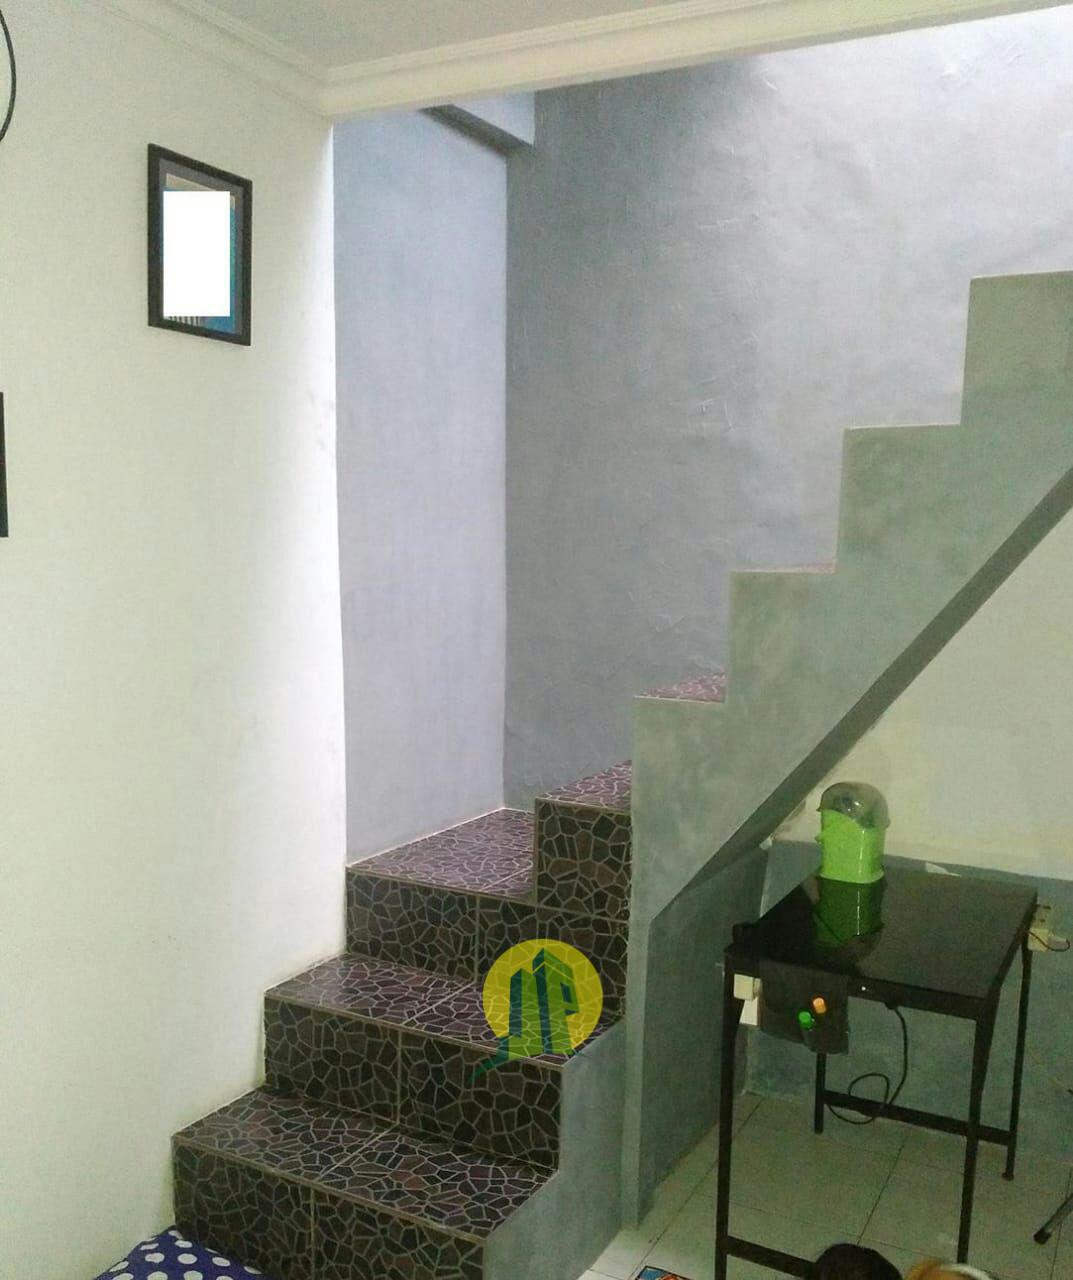 Rumah di Cileunyi Bandung